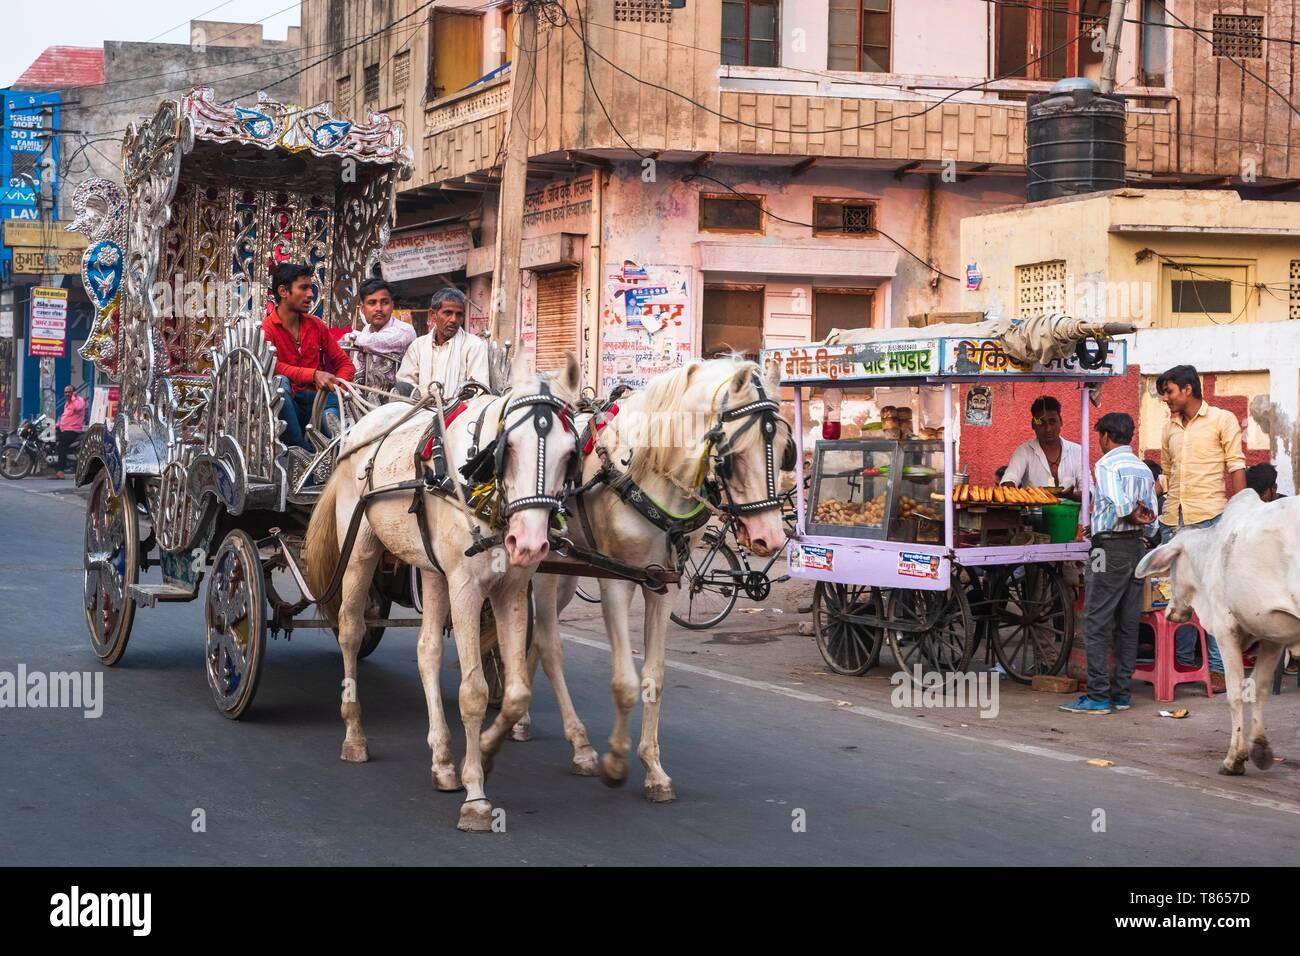 India, Rajasthan, Bharatpur, old city - Stock Image